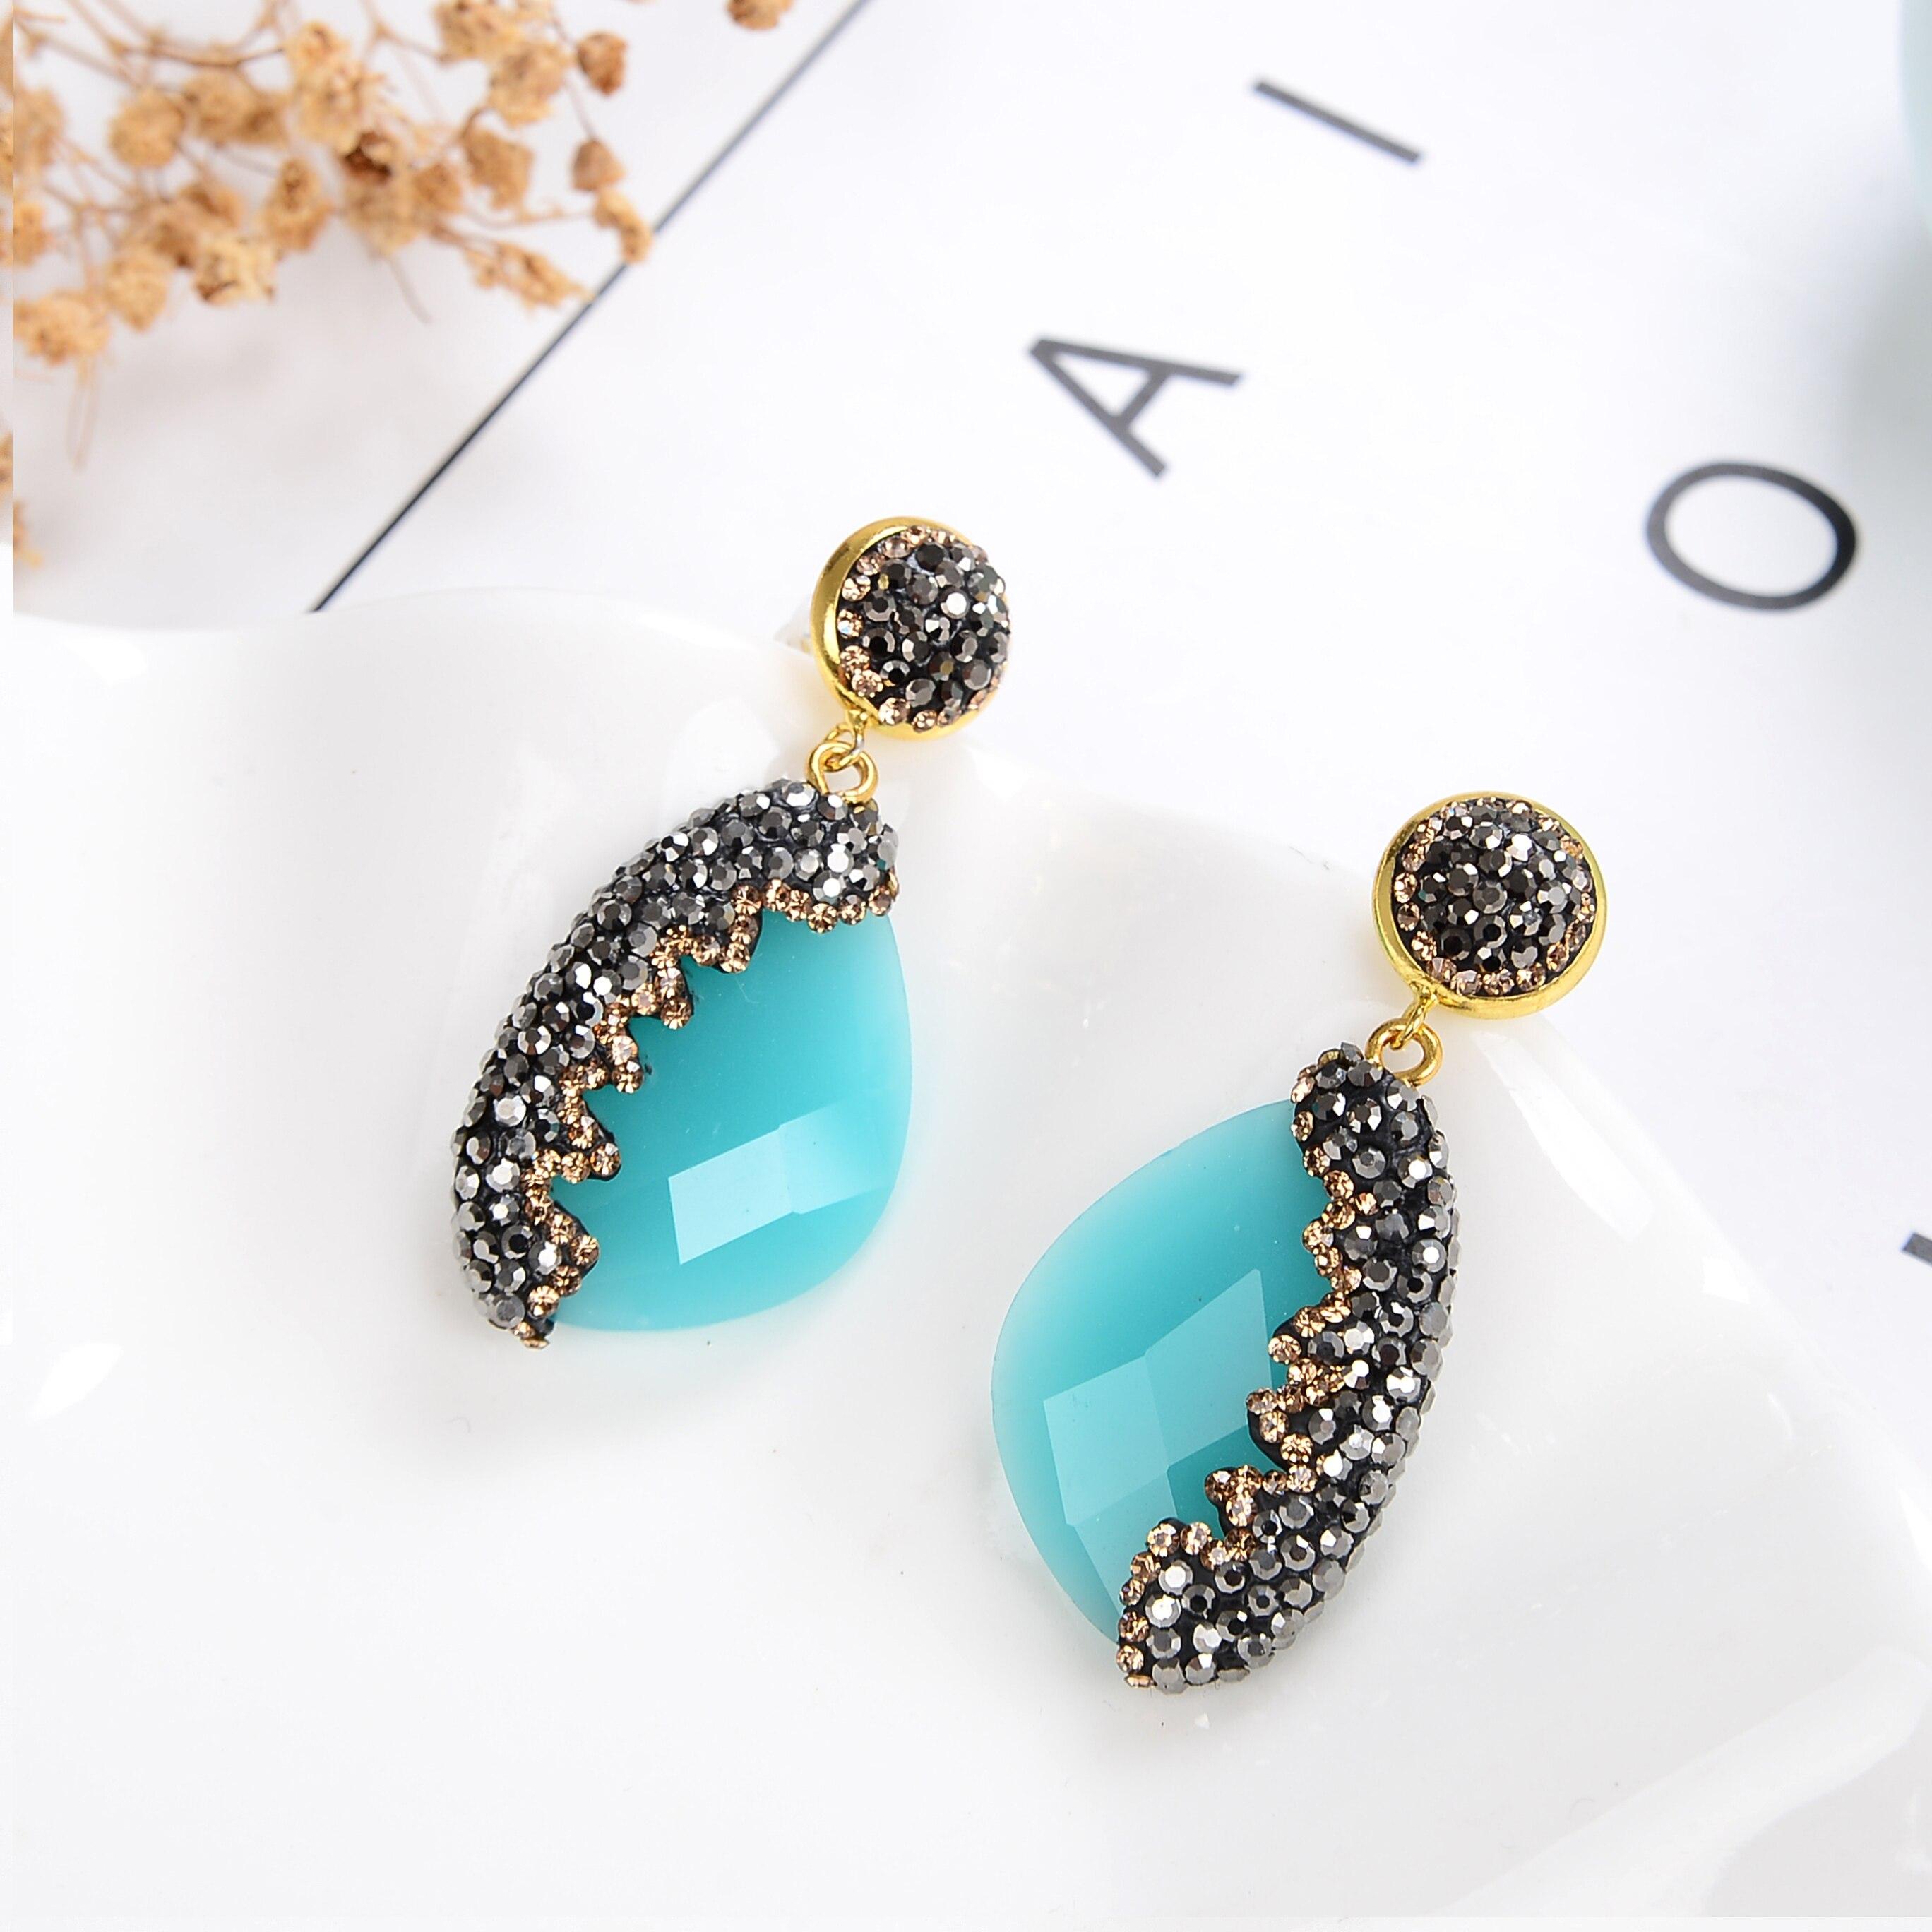 11 Style Luxury Geometric Drop Earrings For Women Girls 2020 Charm Rhinestone Dangle Earring Ladies Wedding Jewelry Gifts